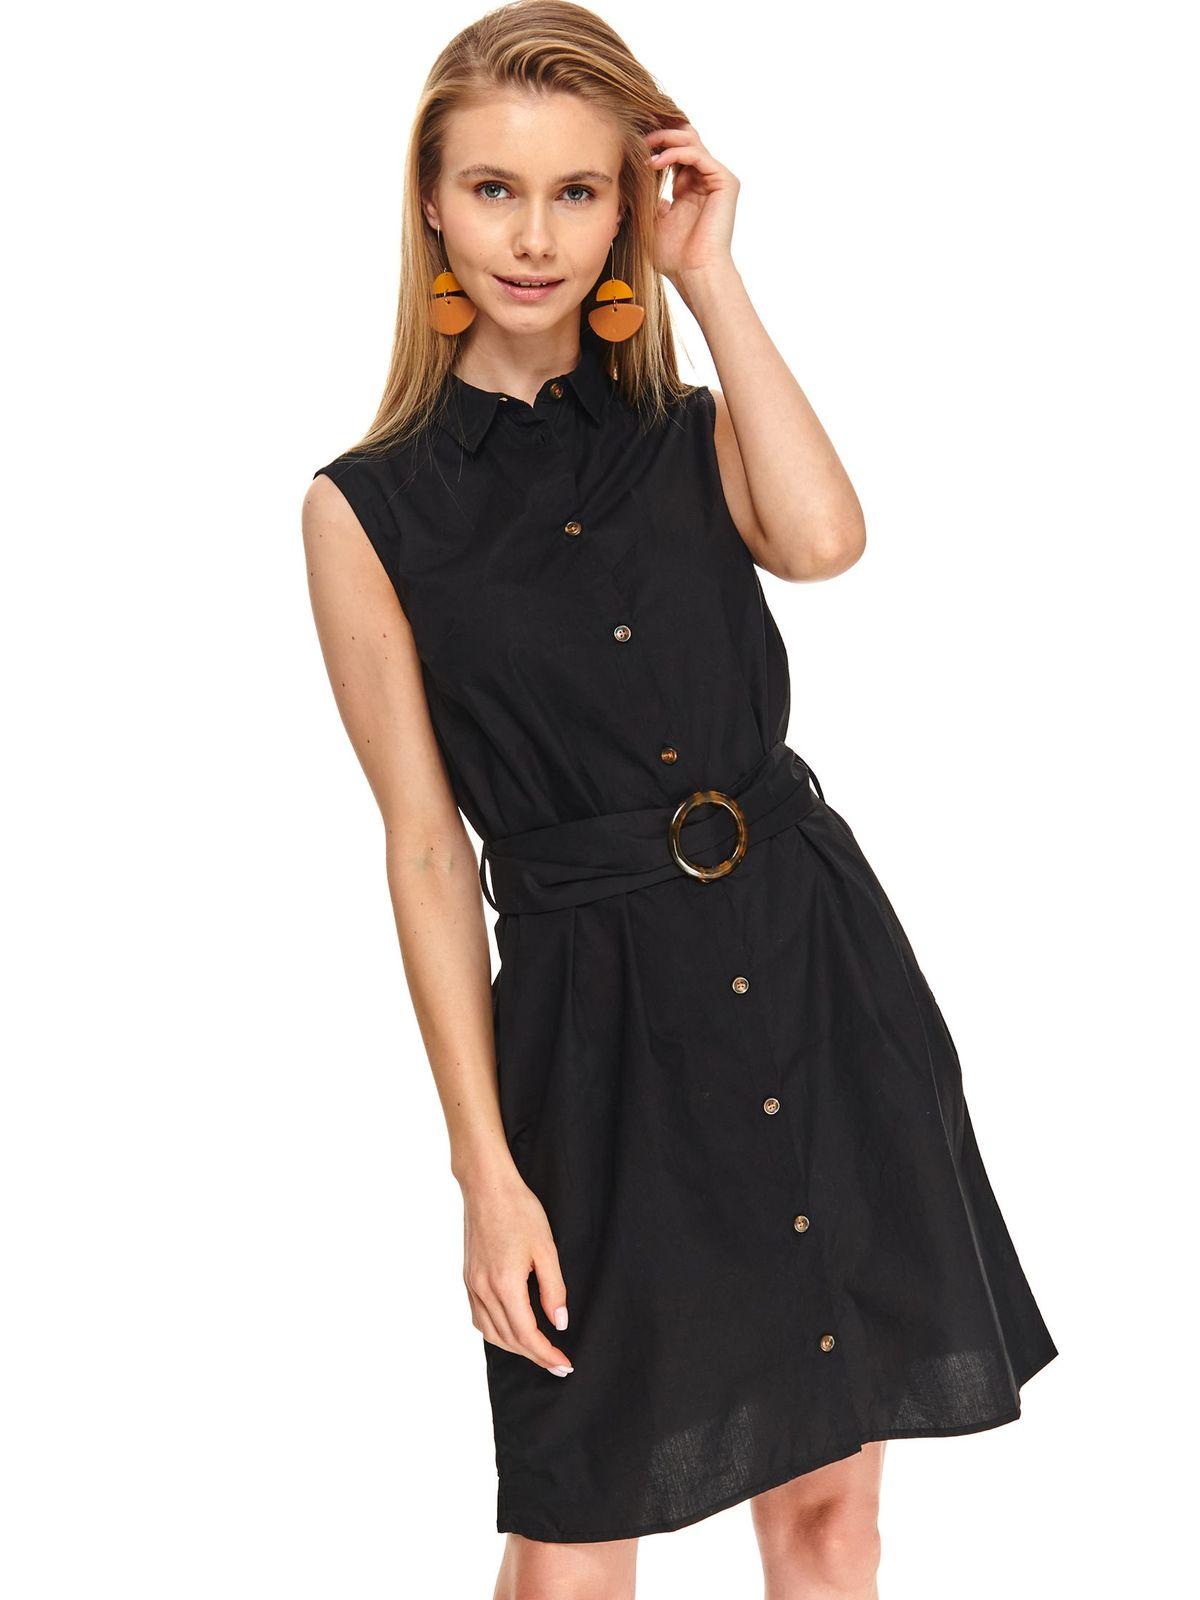 Black dress daily short cut cloche thin fabric sleeveless